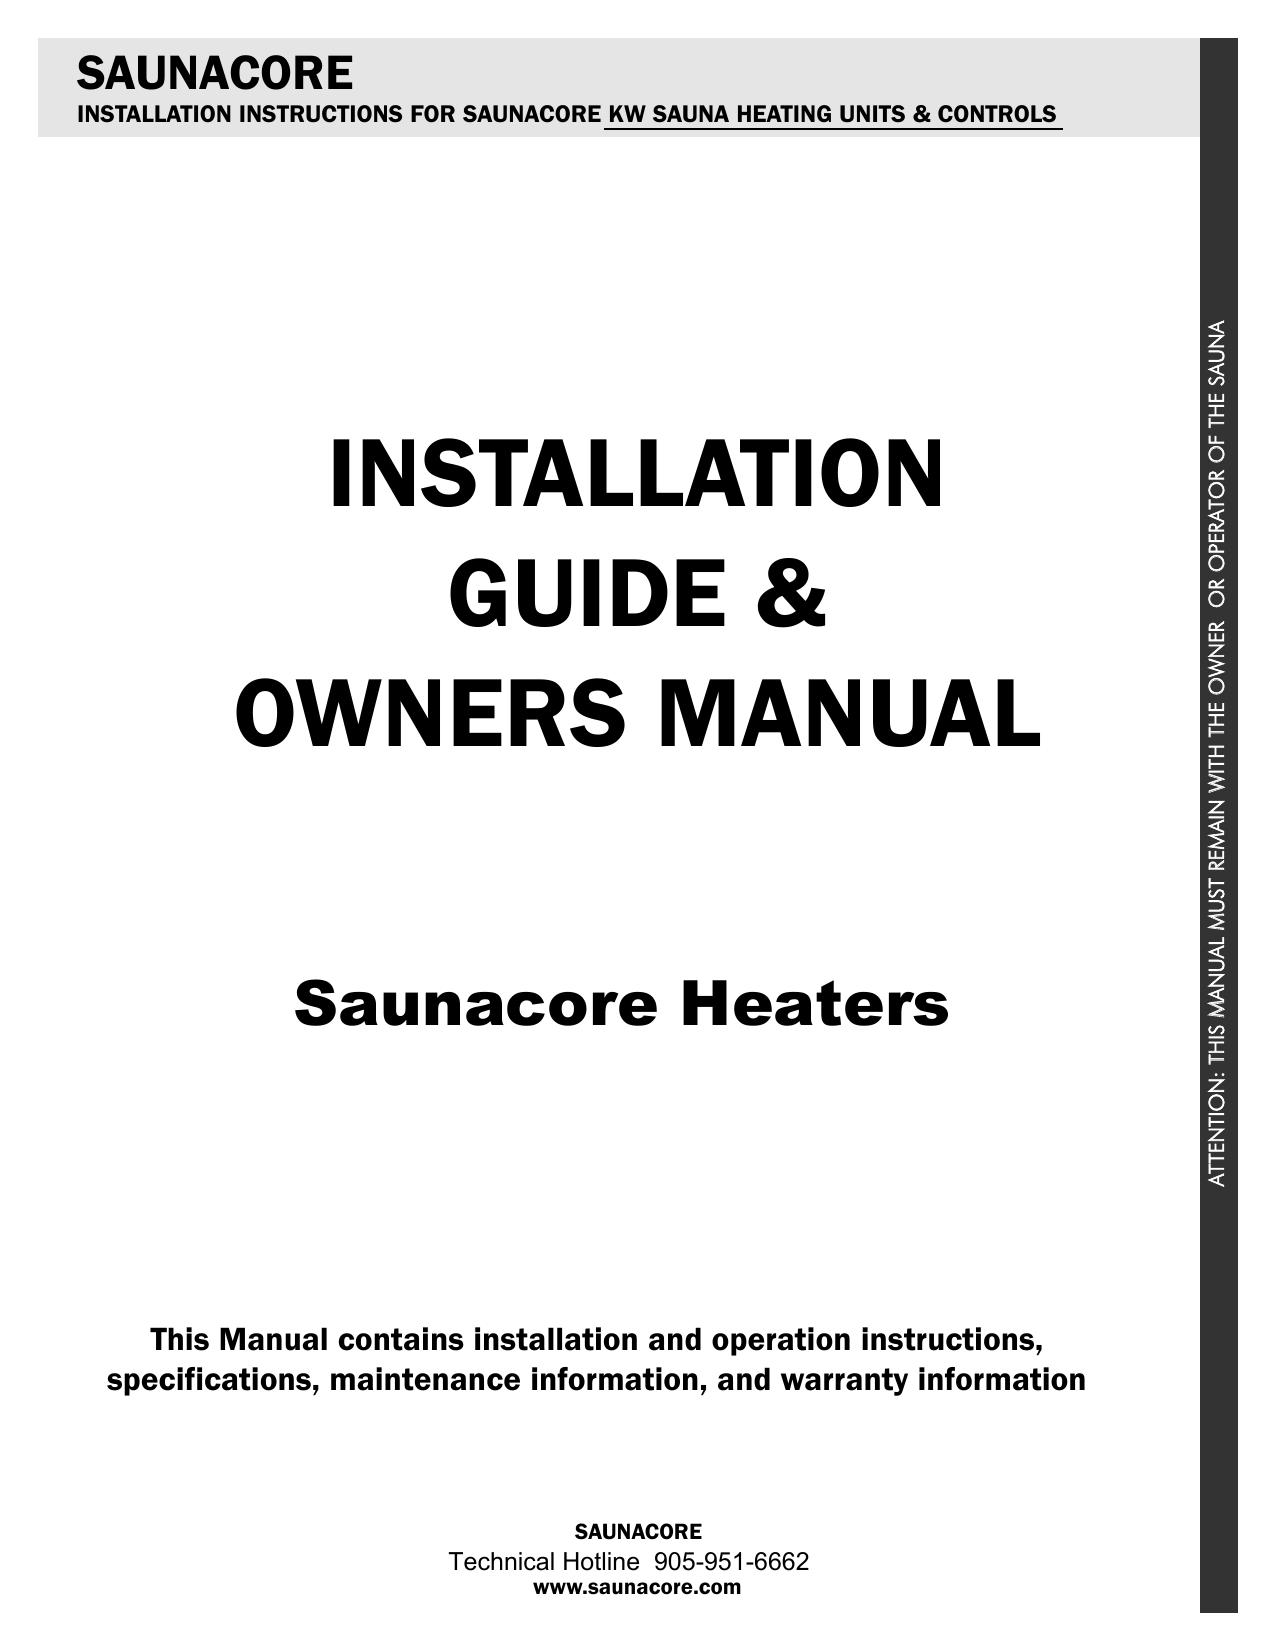 Saunacore Sauna Heater Manual Manualzzcom - Sauna heater wiring diagram